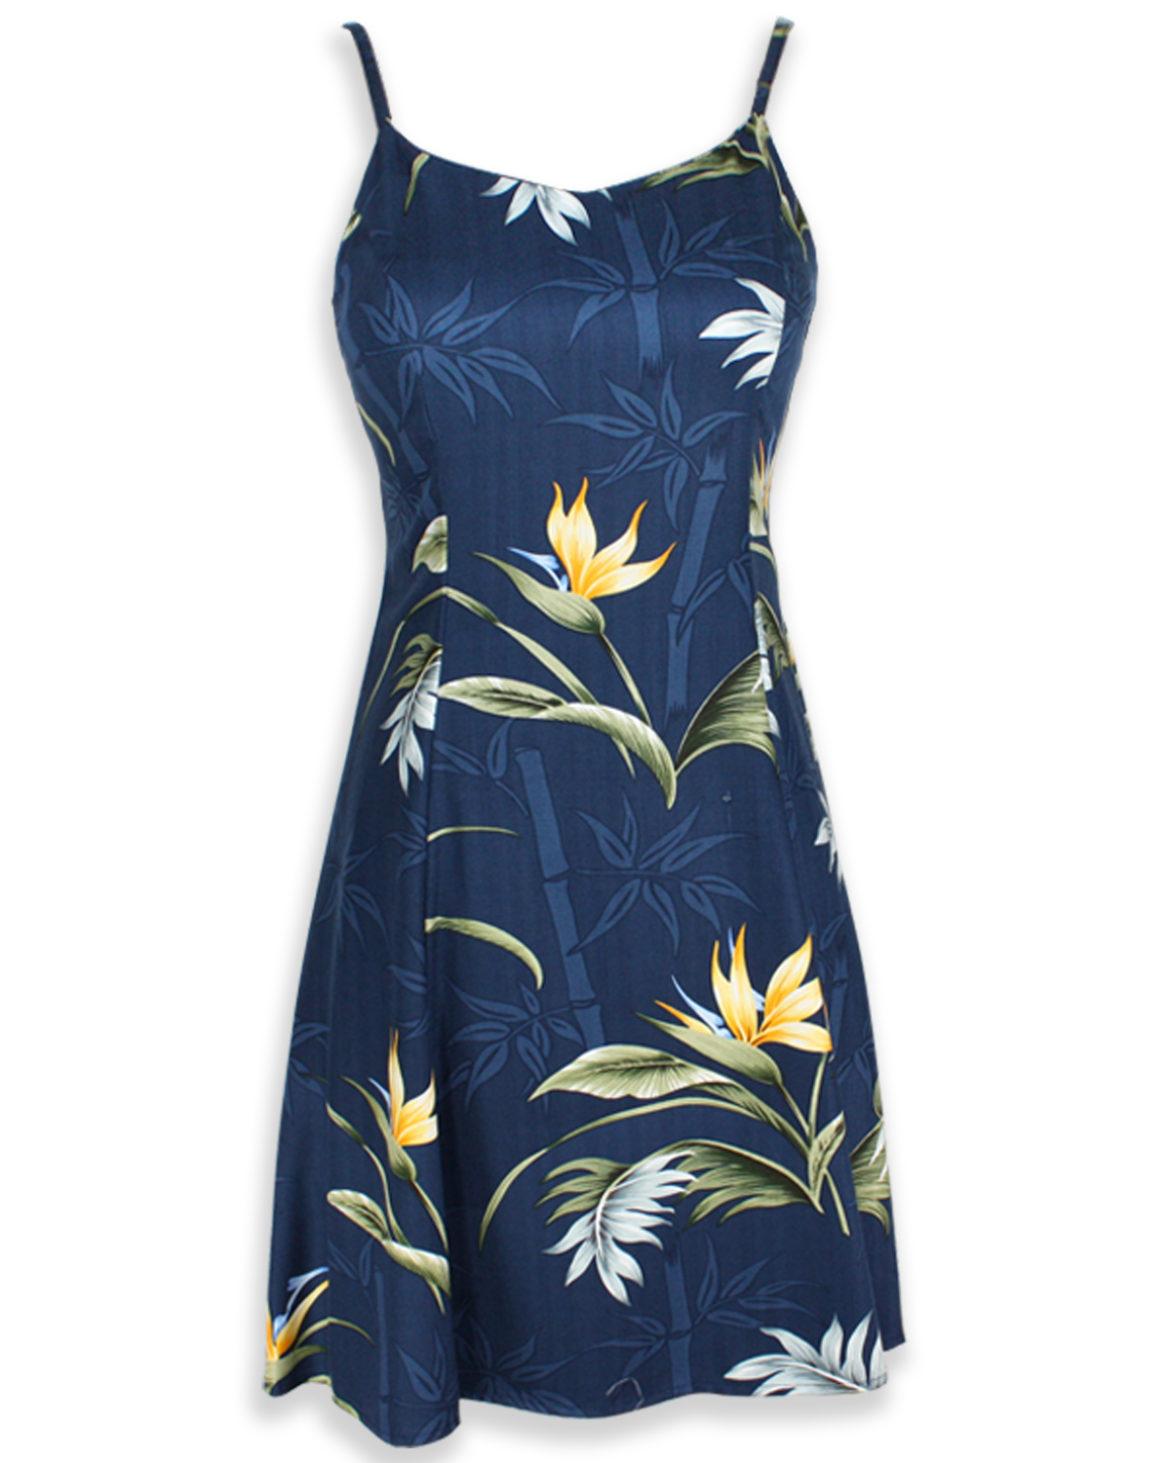 Paradise Found Sexy Short Sundress - Bamboo Paradise Navy Blue